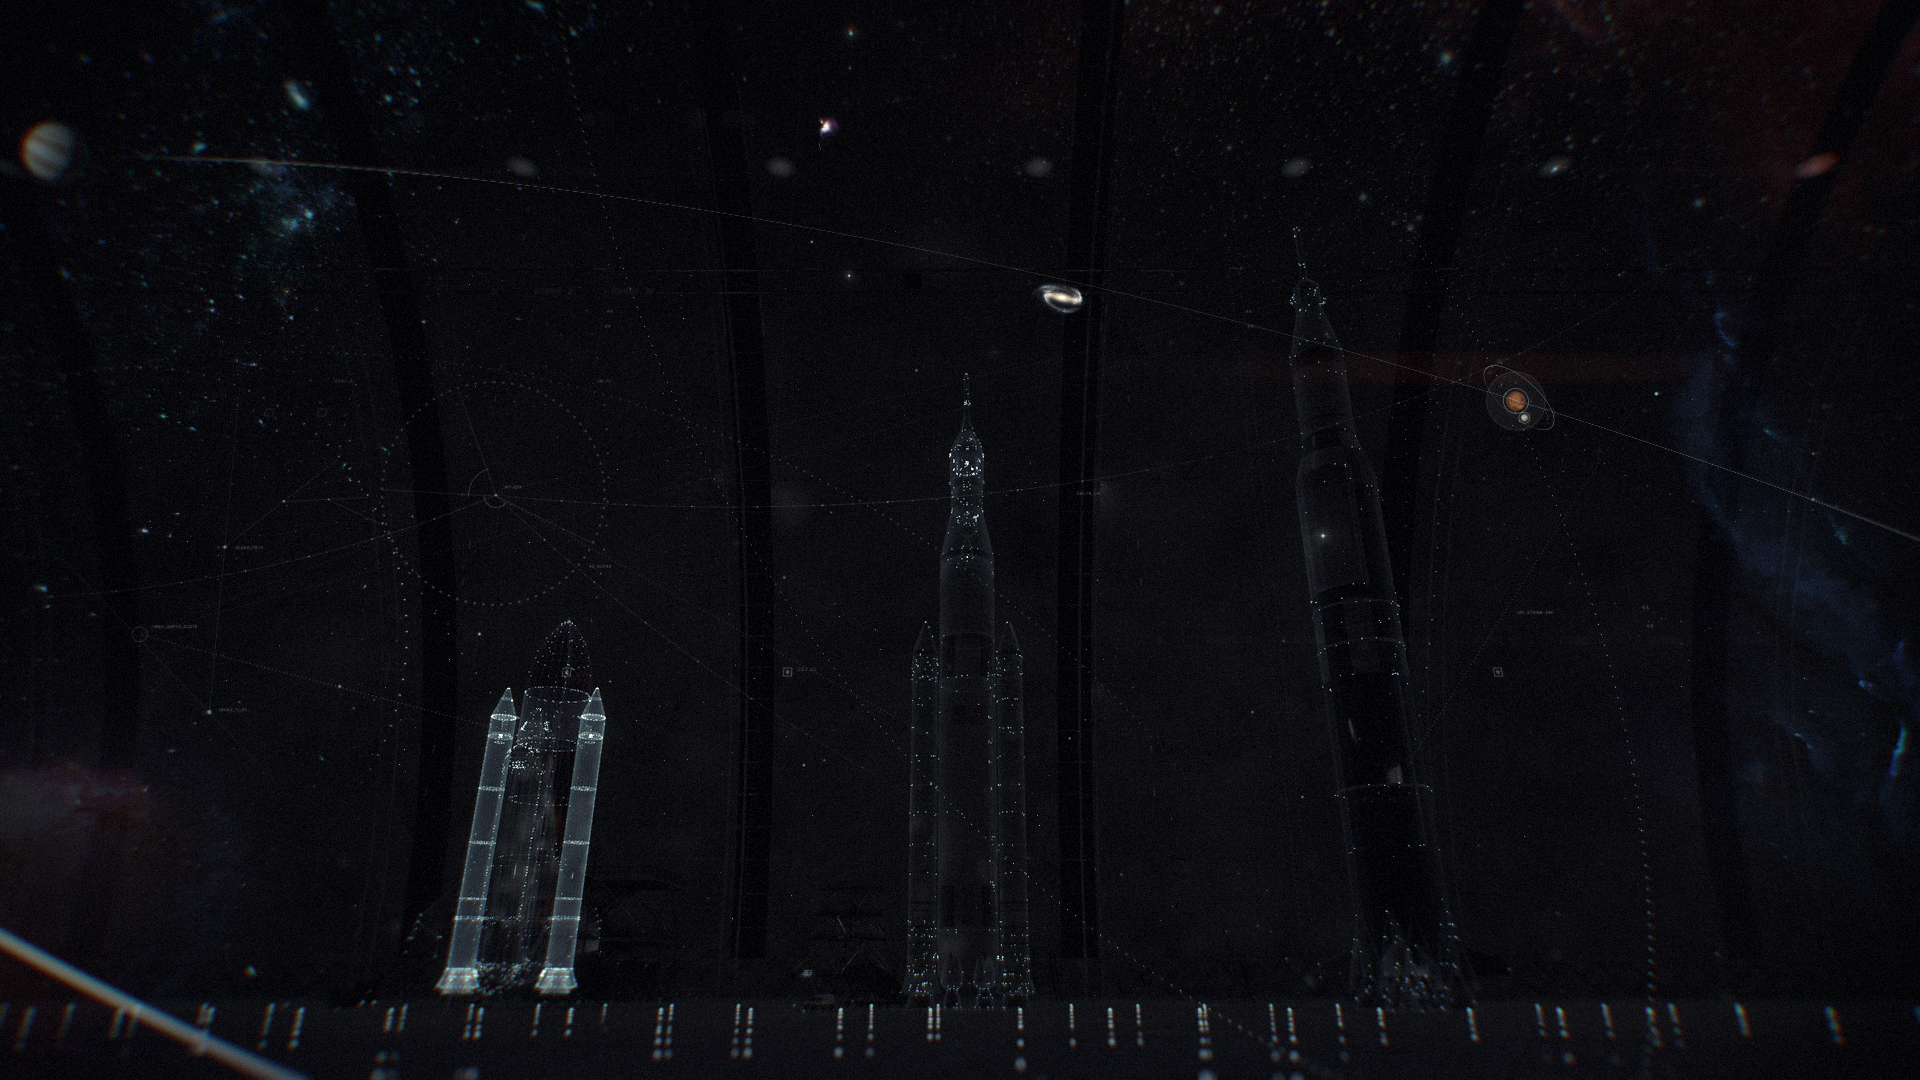 03_Planetarium_Wireframes.jpg